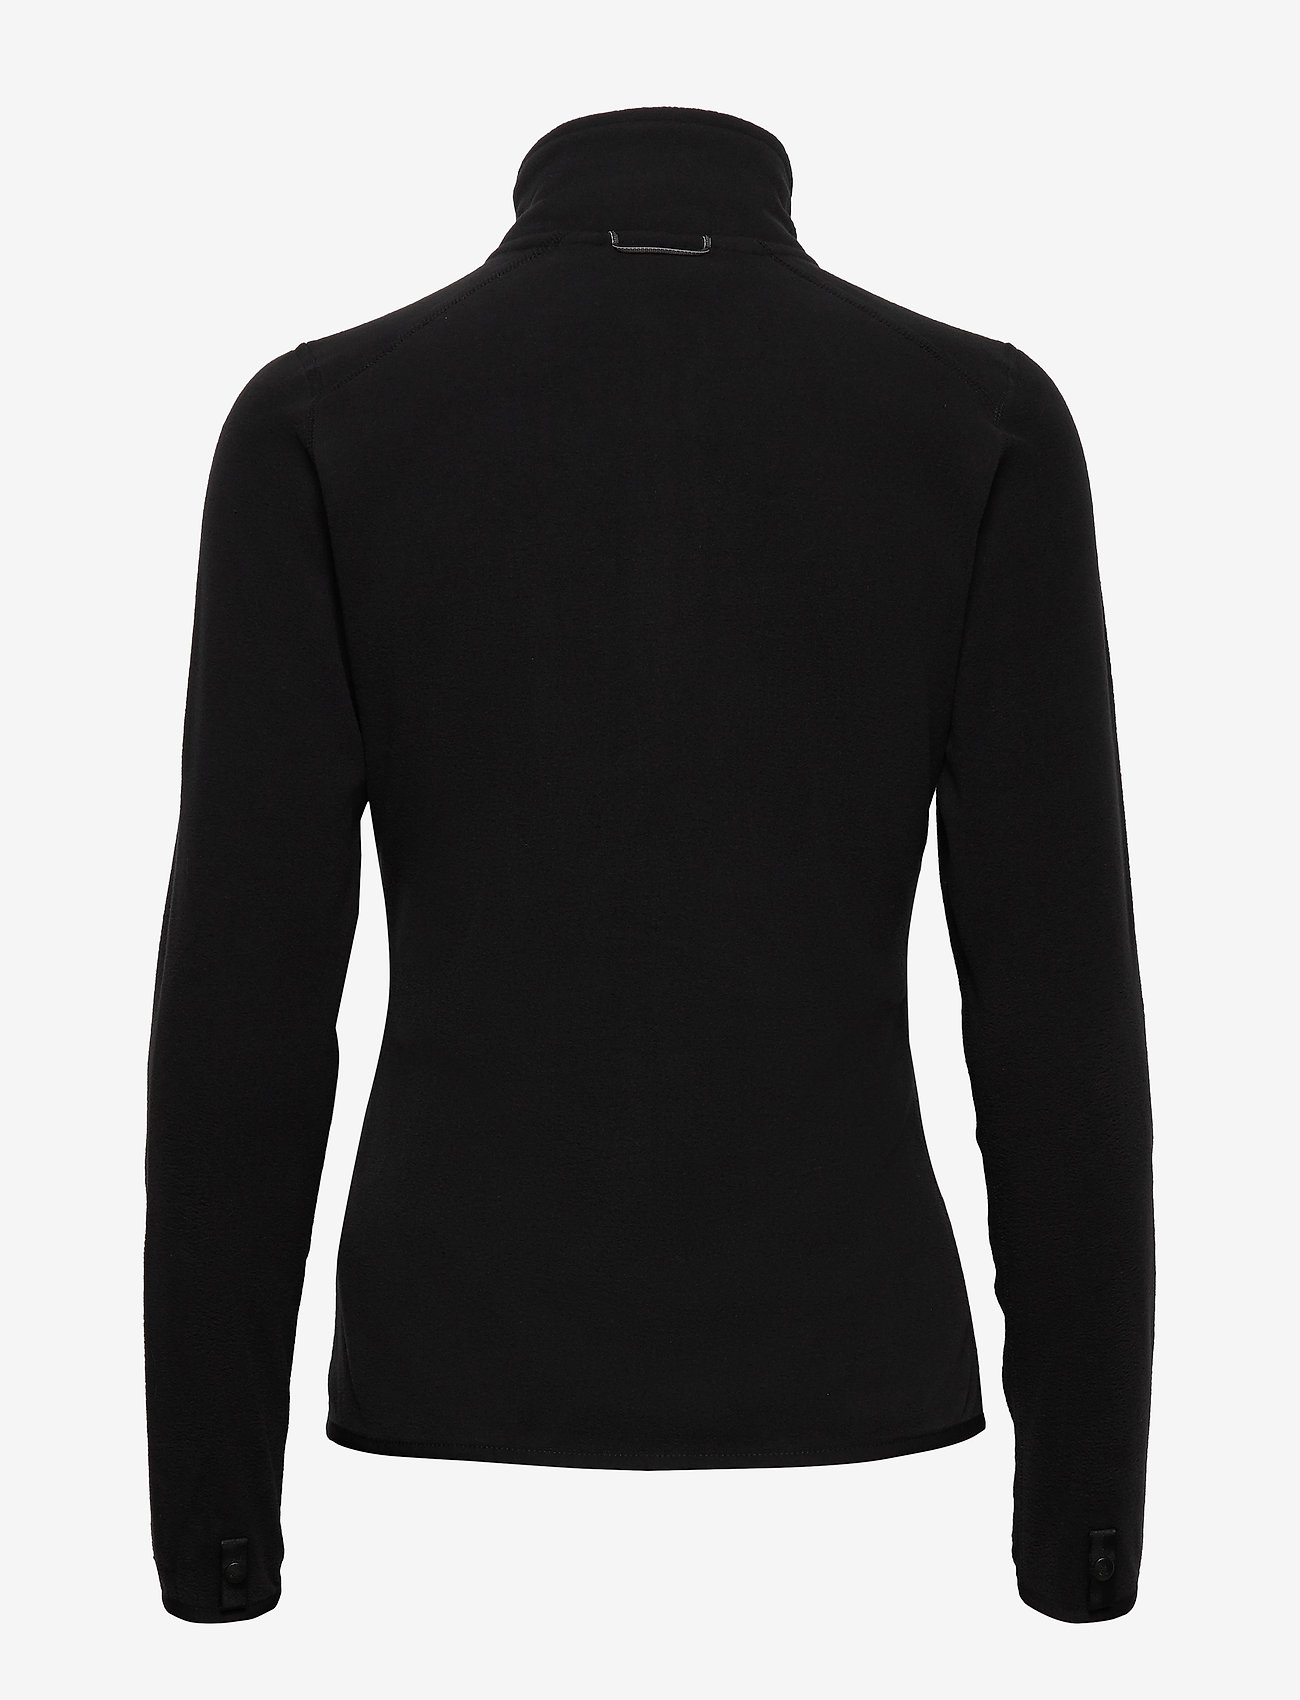 The North Face - W 100 GLACIER FULL ZIP - EU - fleece - tnf black - 1